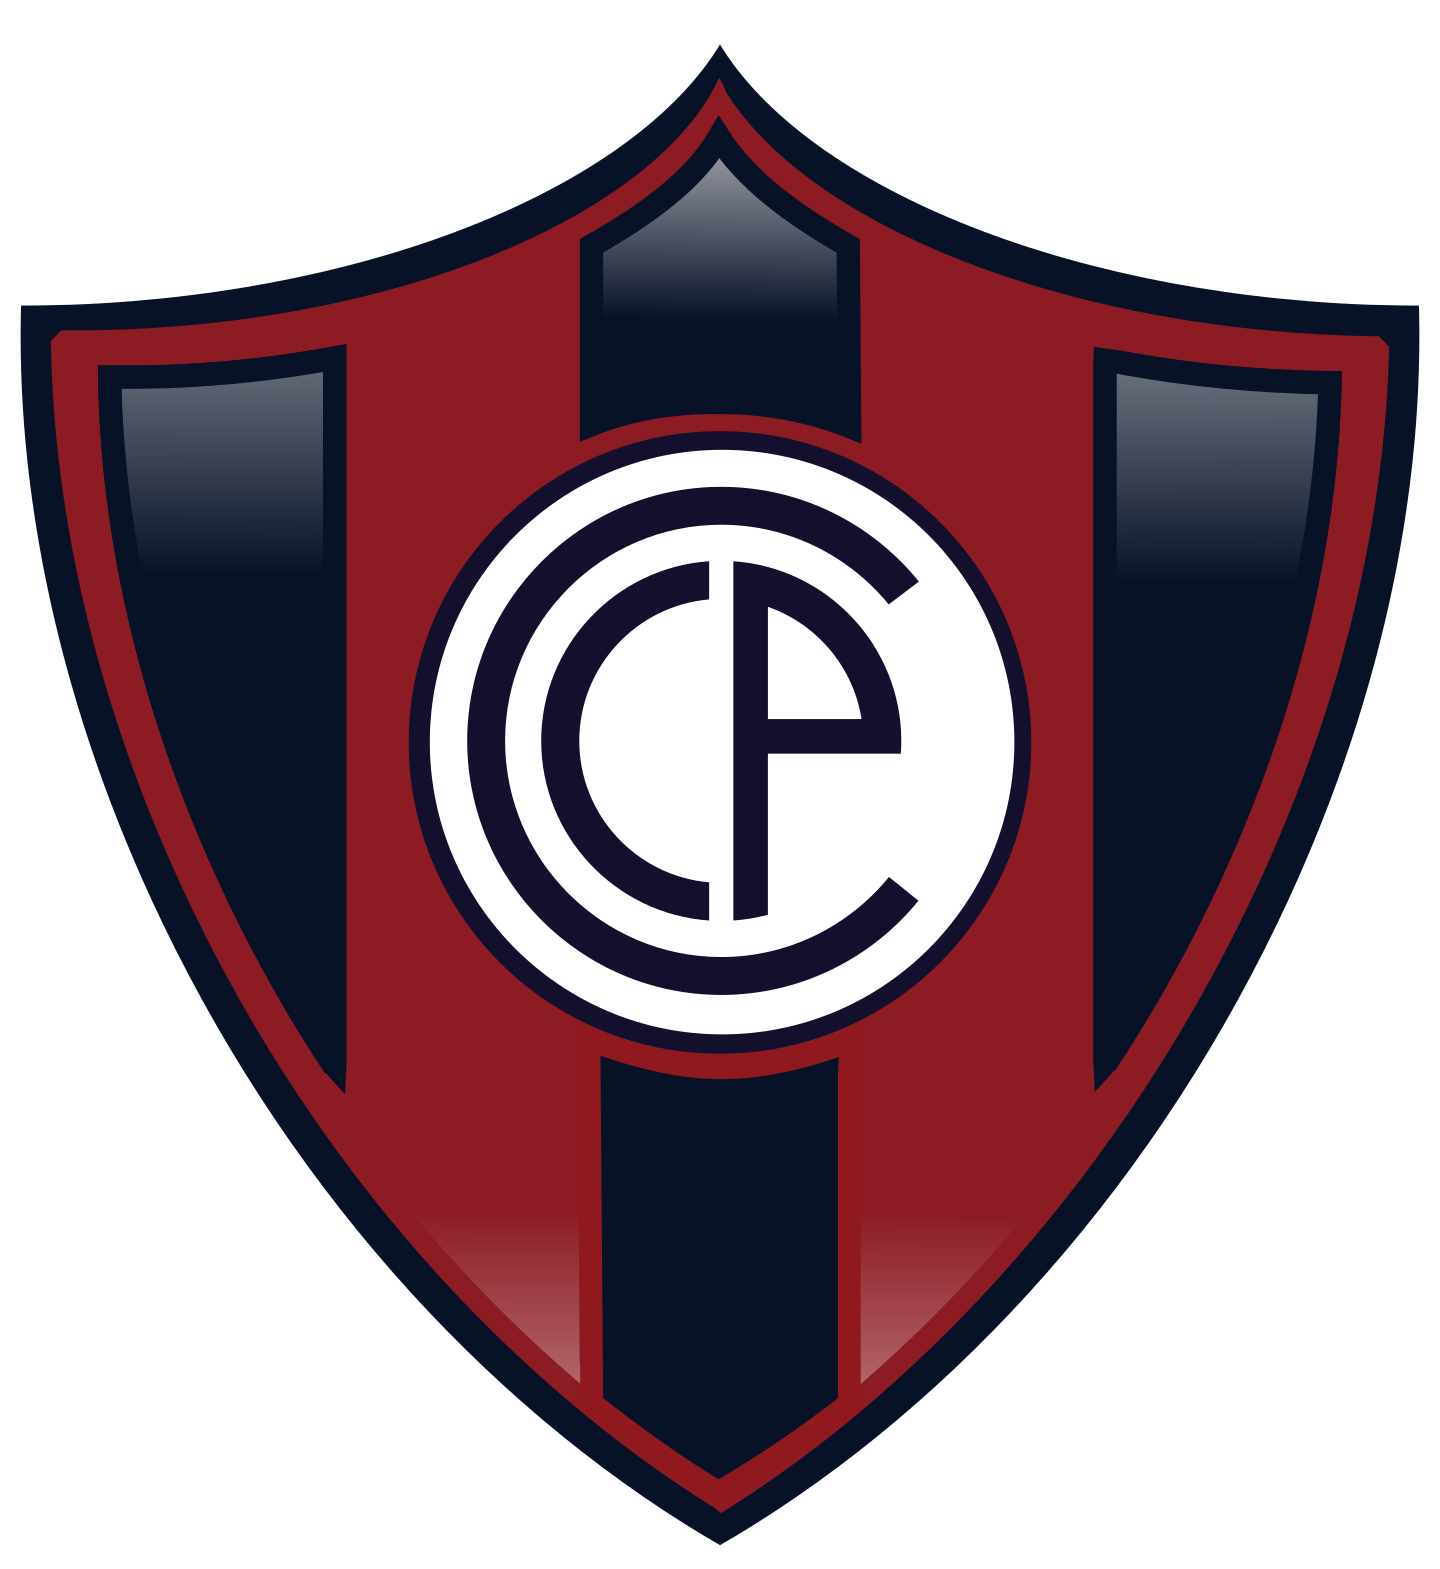 cerro porteno logo 2 1 - Cerro Porteño Logo - Escudo